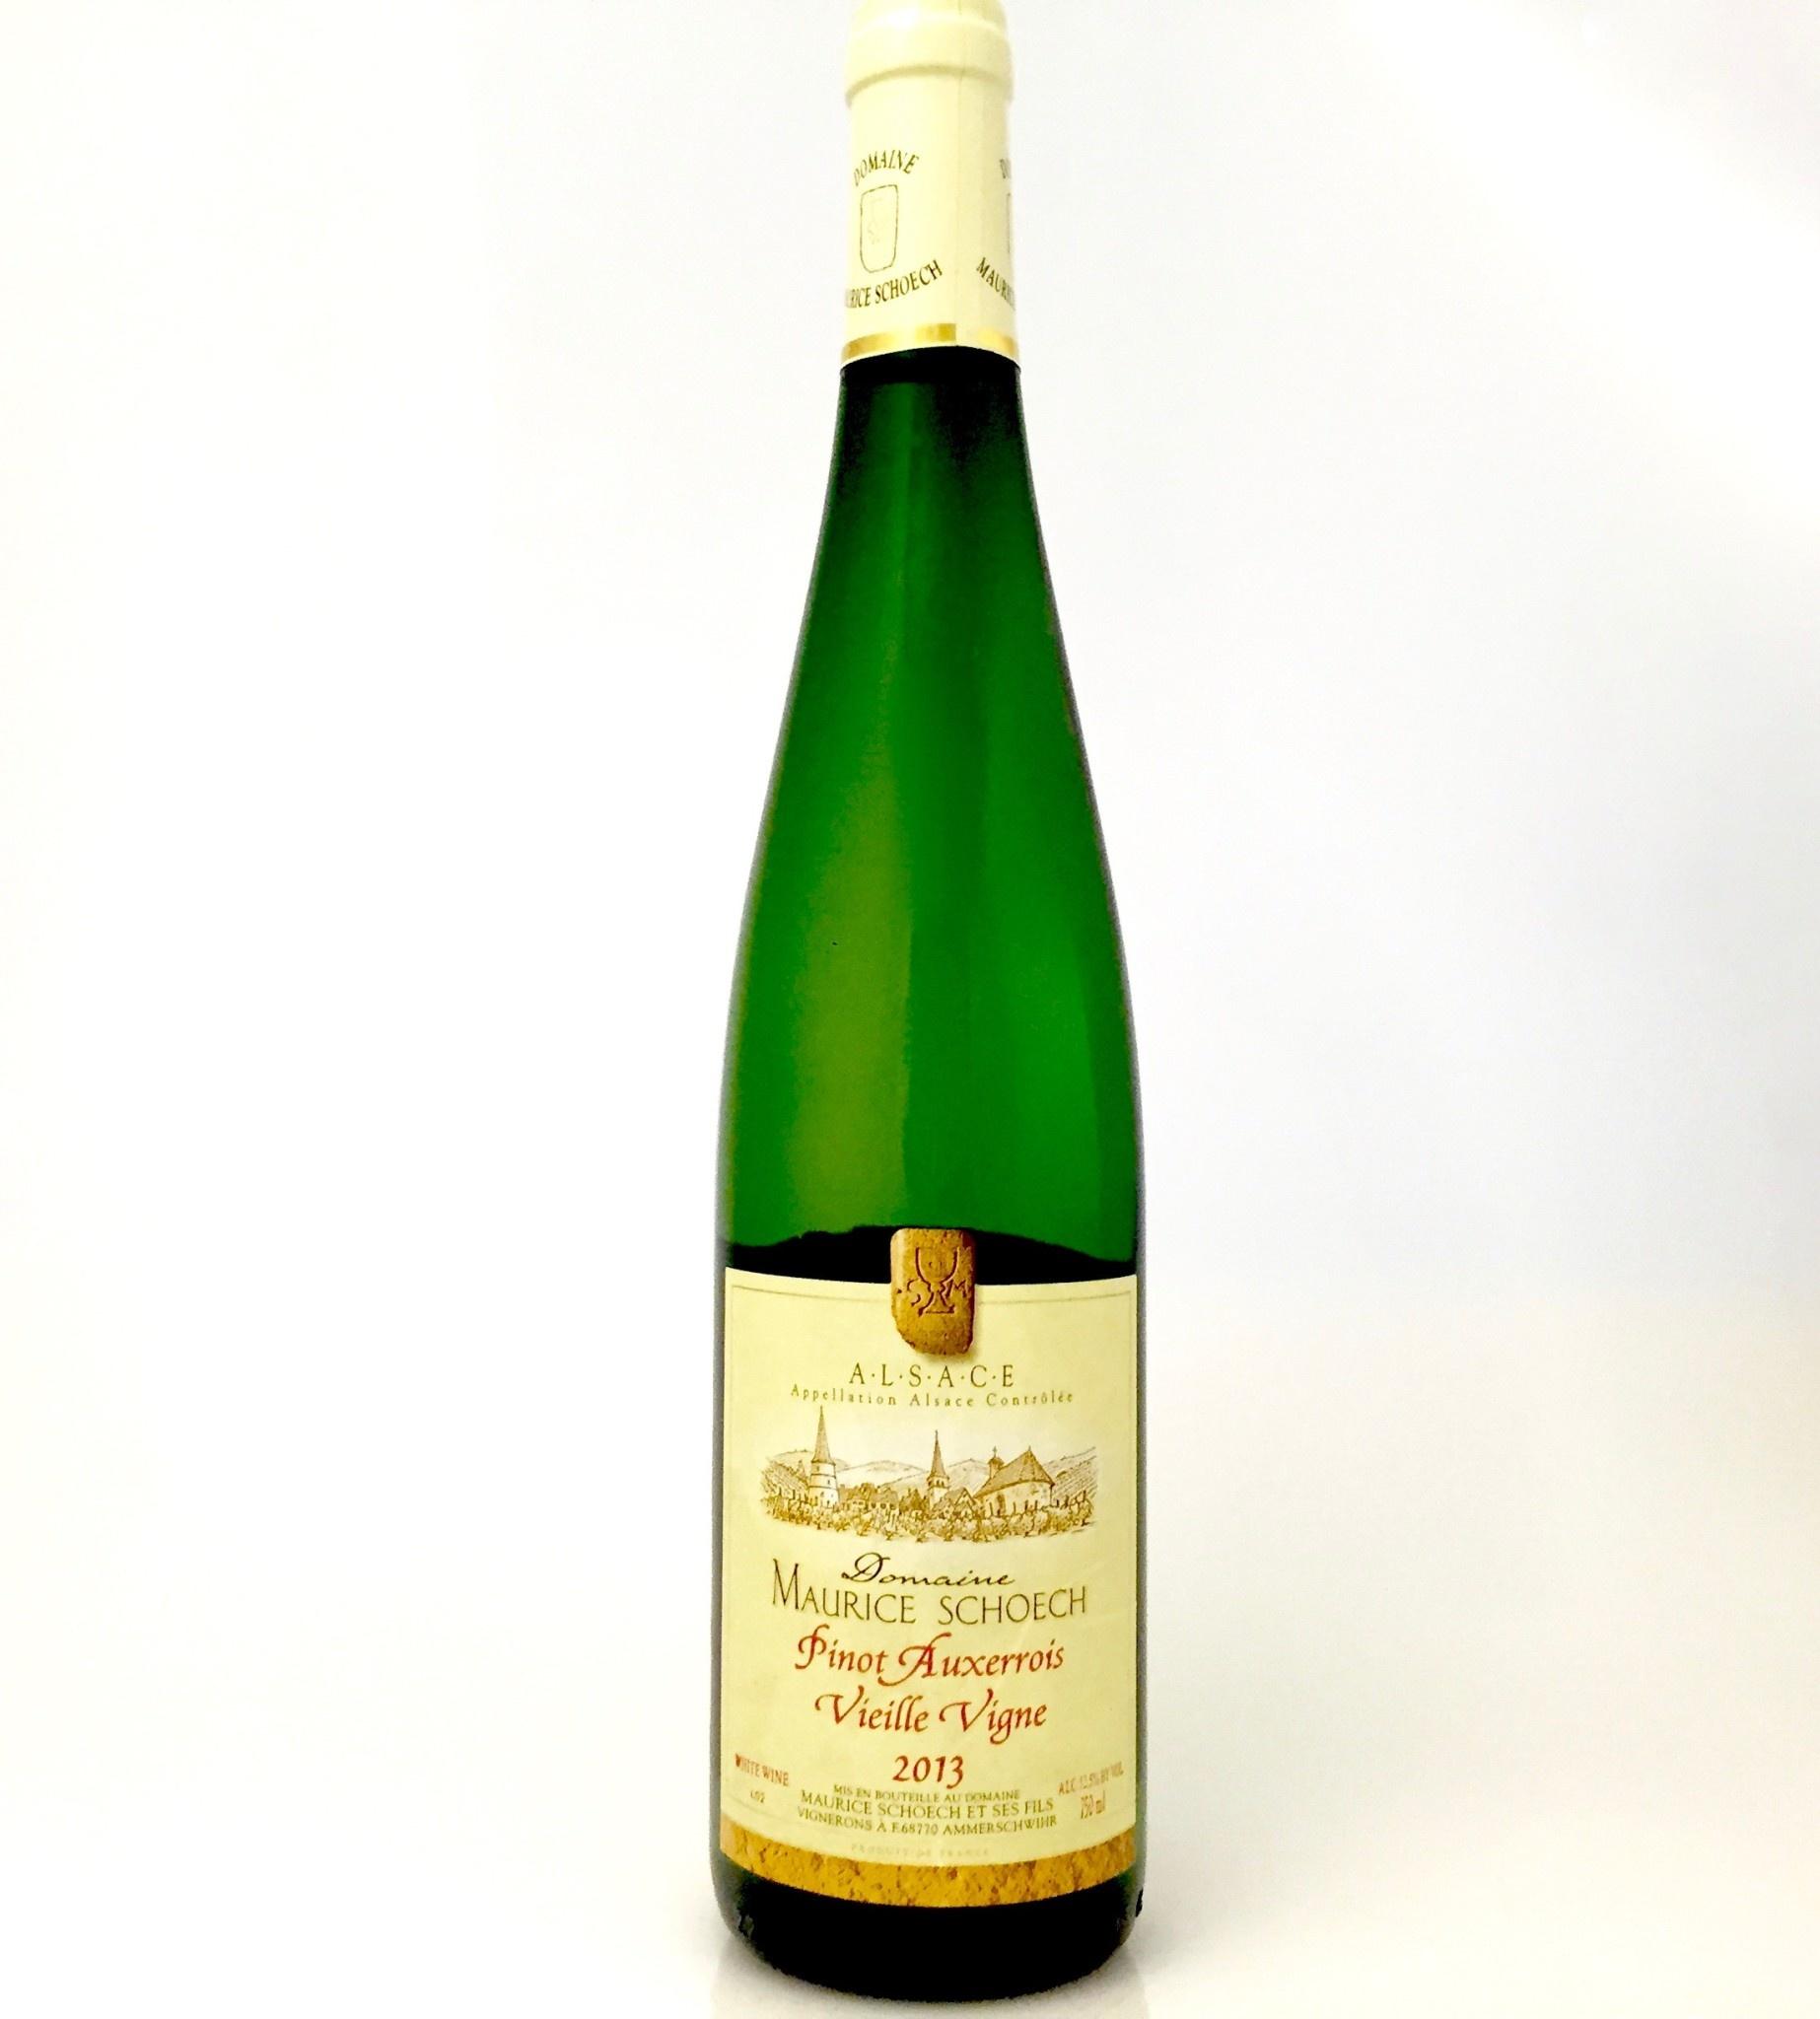 Alsace Pinot Auxerrois VV 2018 Domaine Maurice Schoech